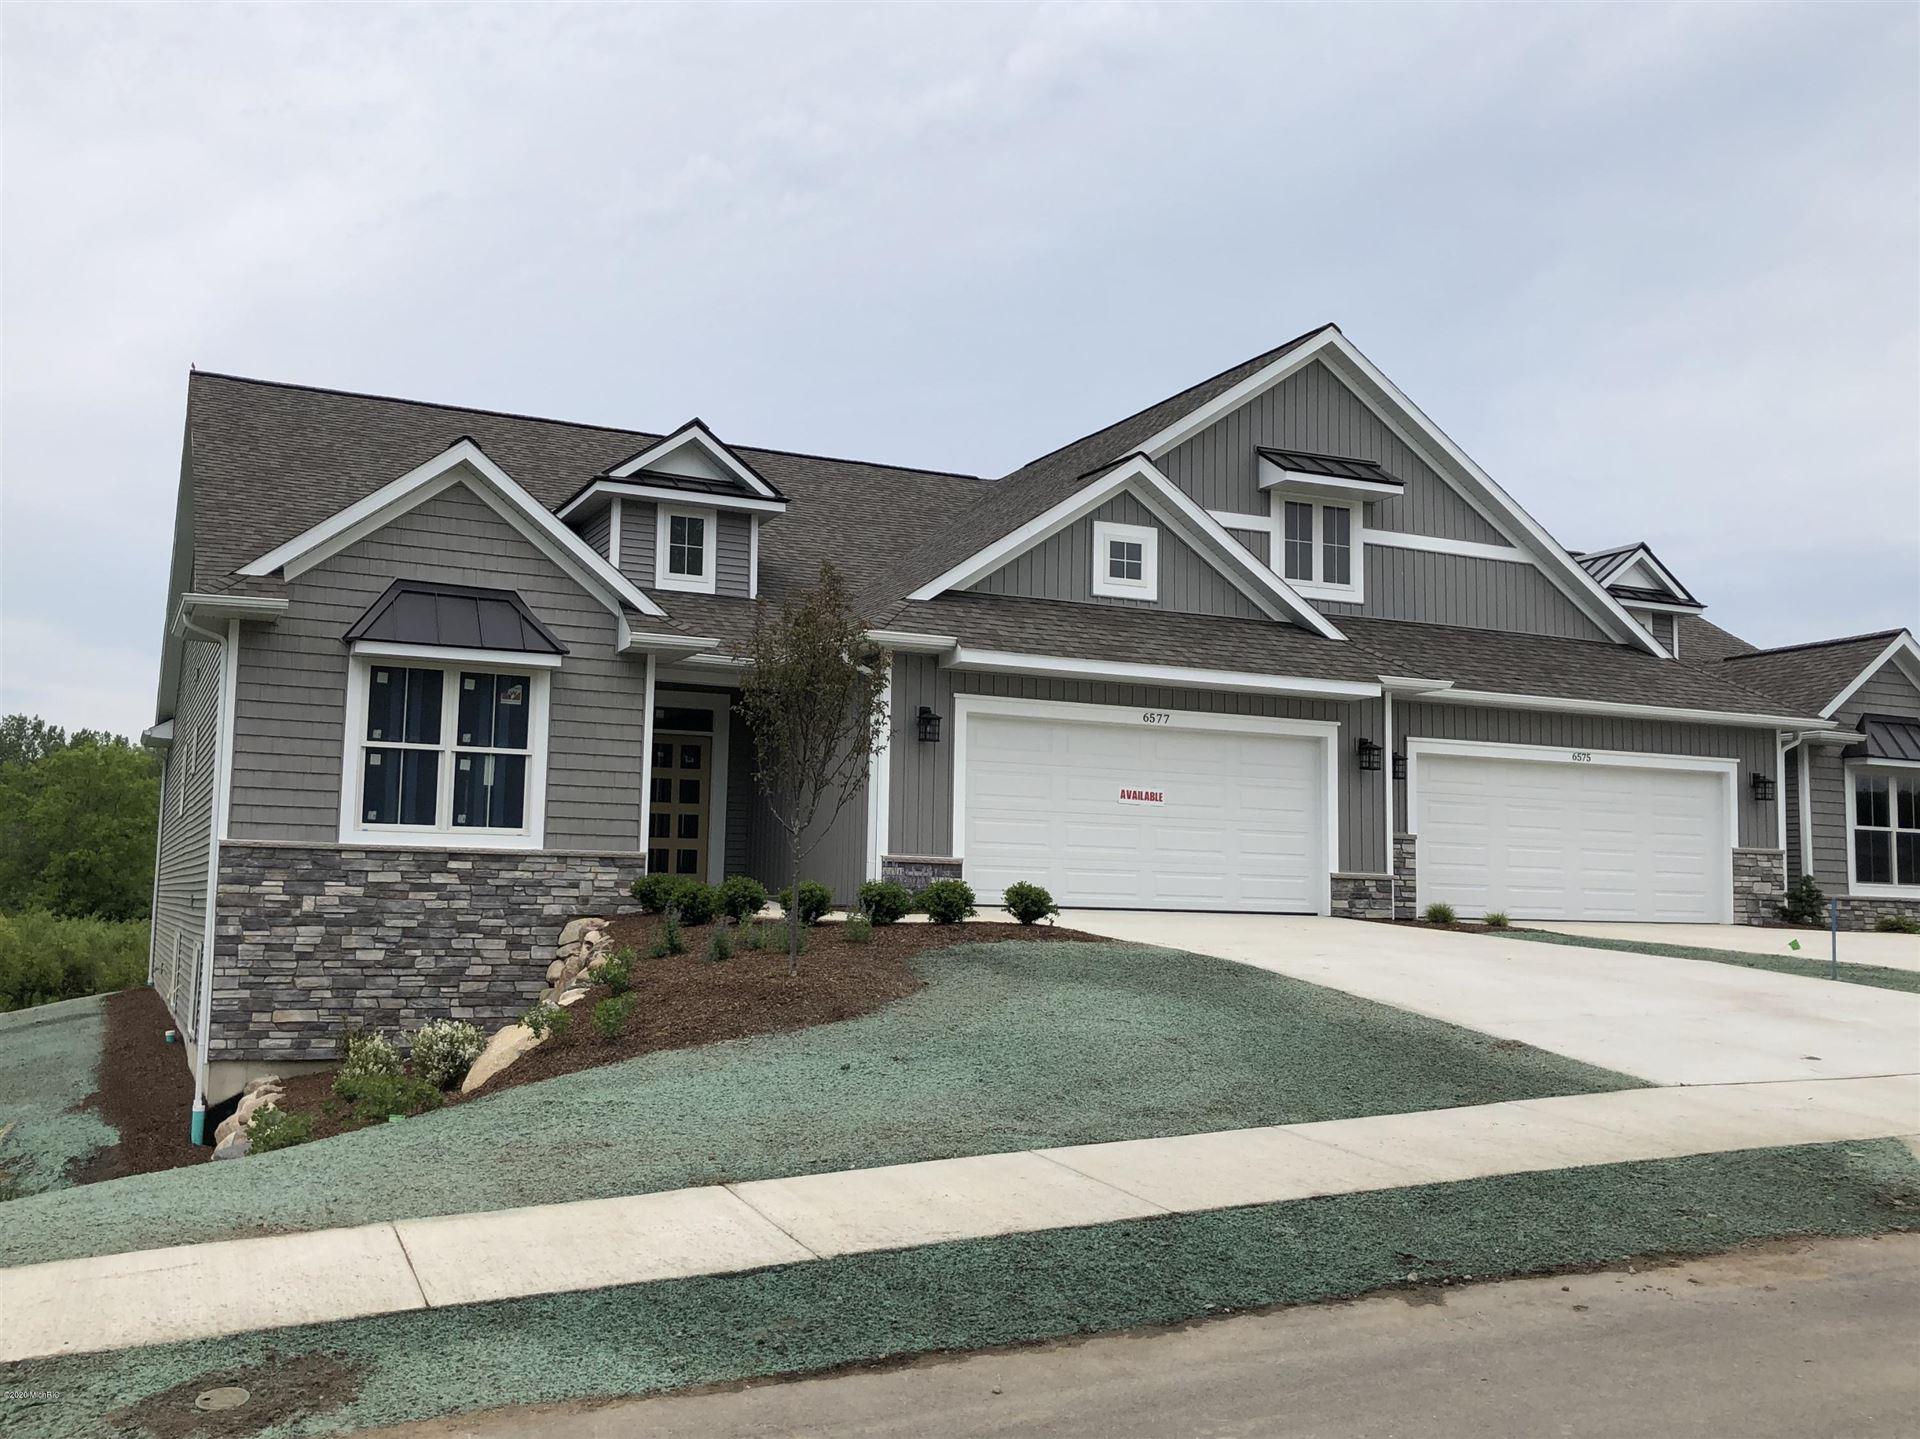 6577 Creekside View Drive #19, Grand Rapids, MI 49548 - #: 19042627